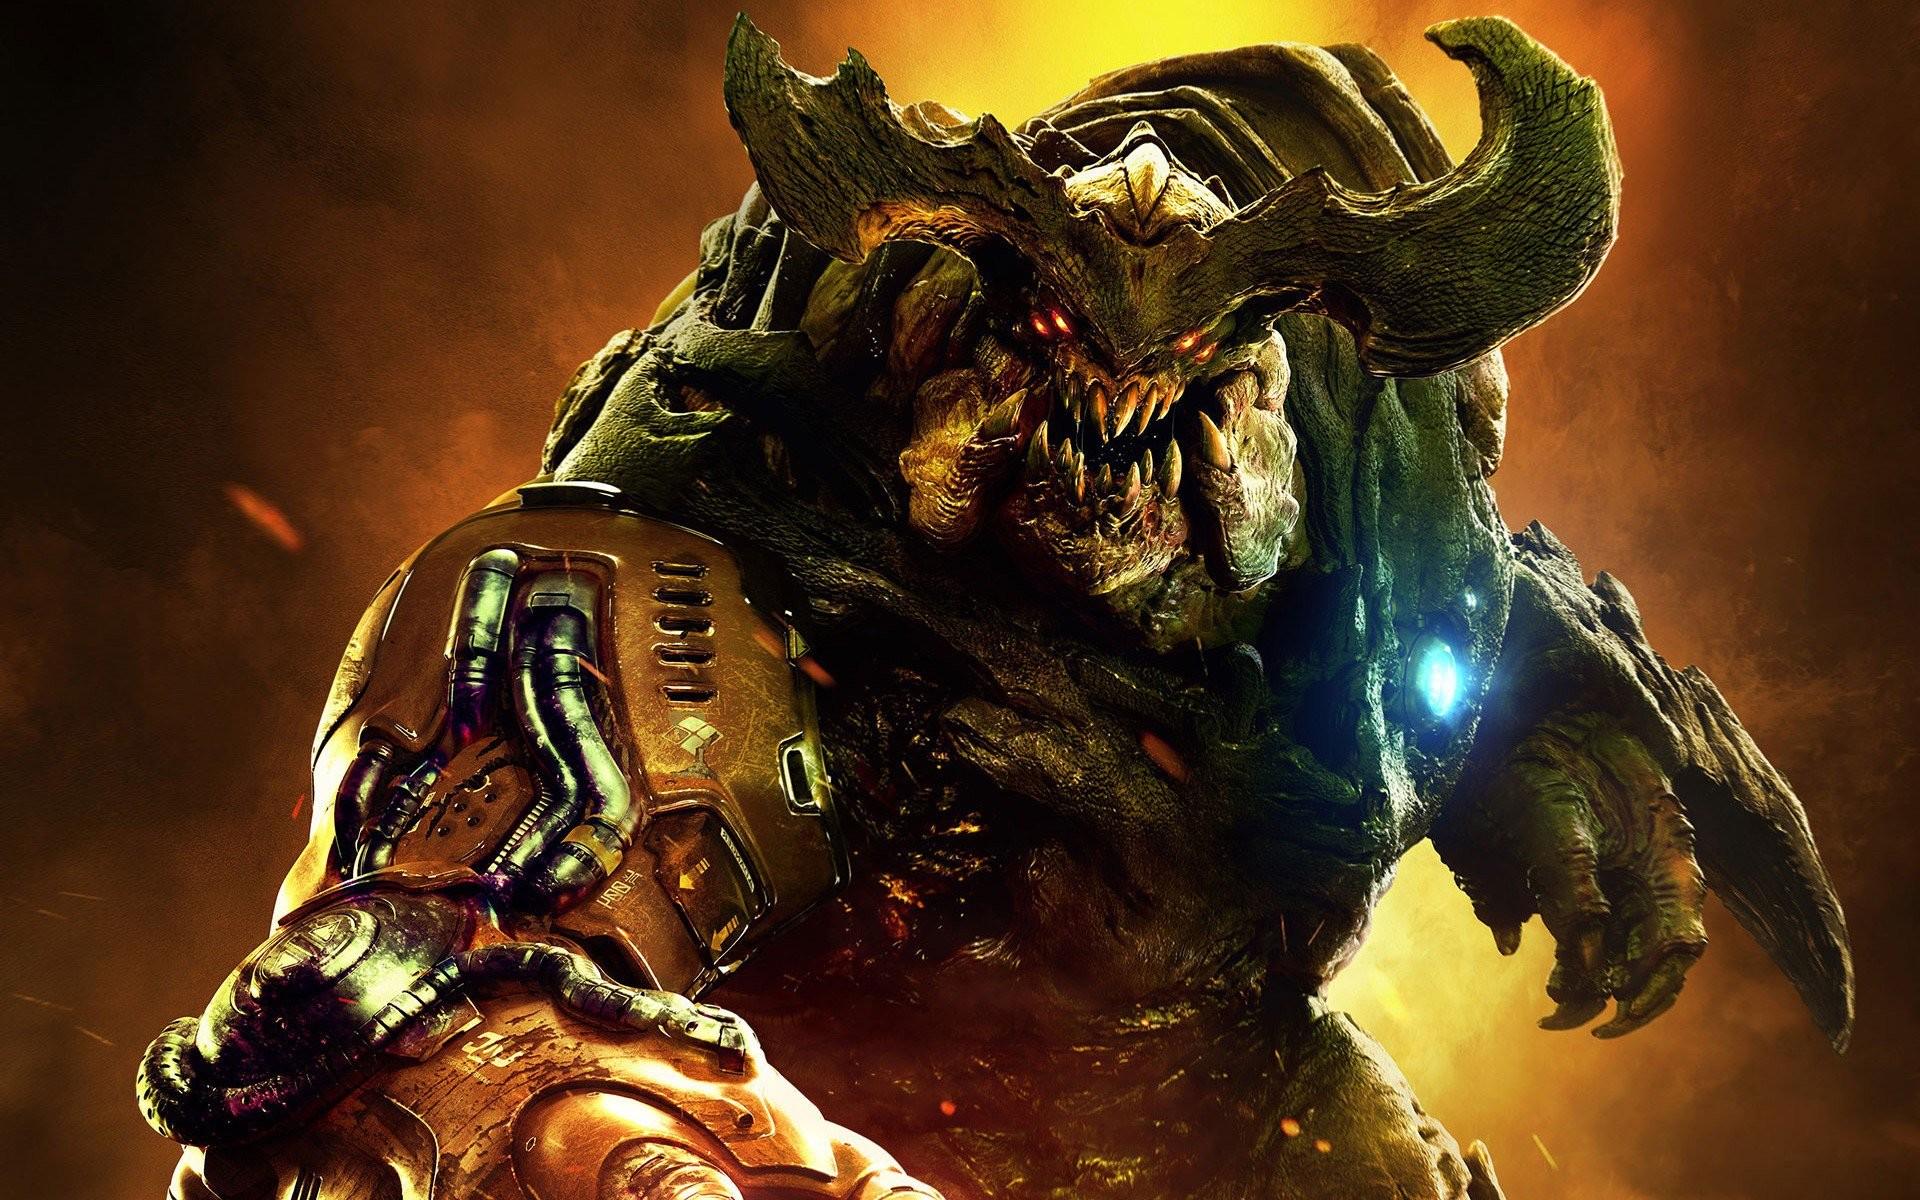 https://hdqwalls.com/wallpapers/doom-2016-monster.jpg   Horror   Pinterest    Game concept art, Game concept and Wallpaper